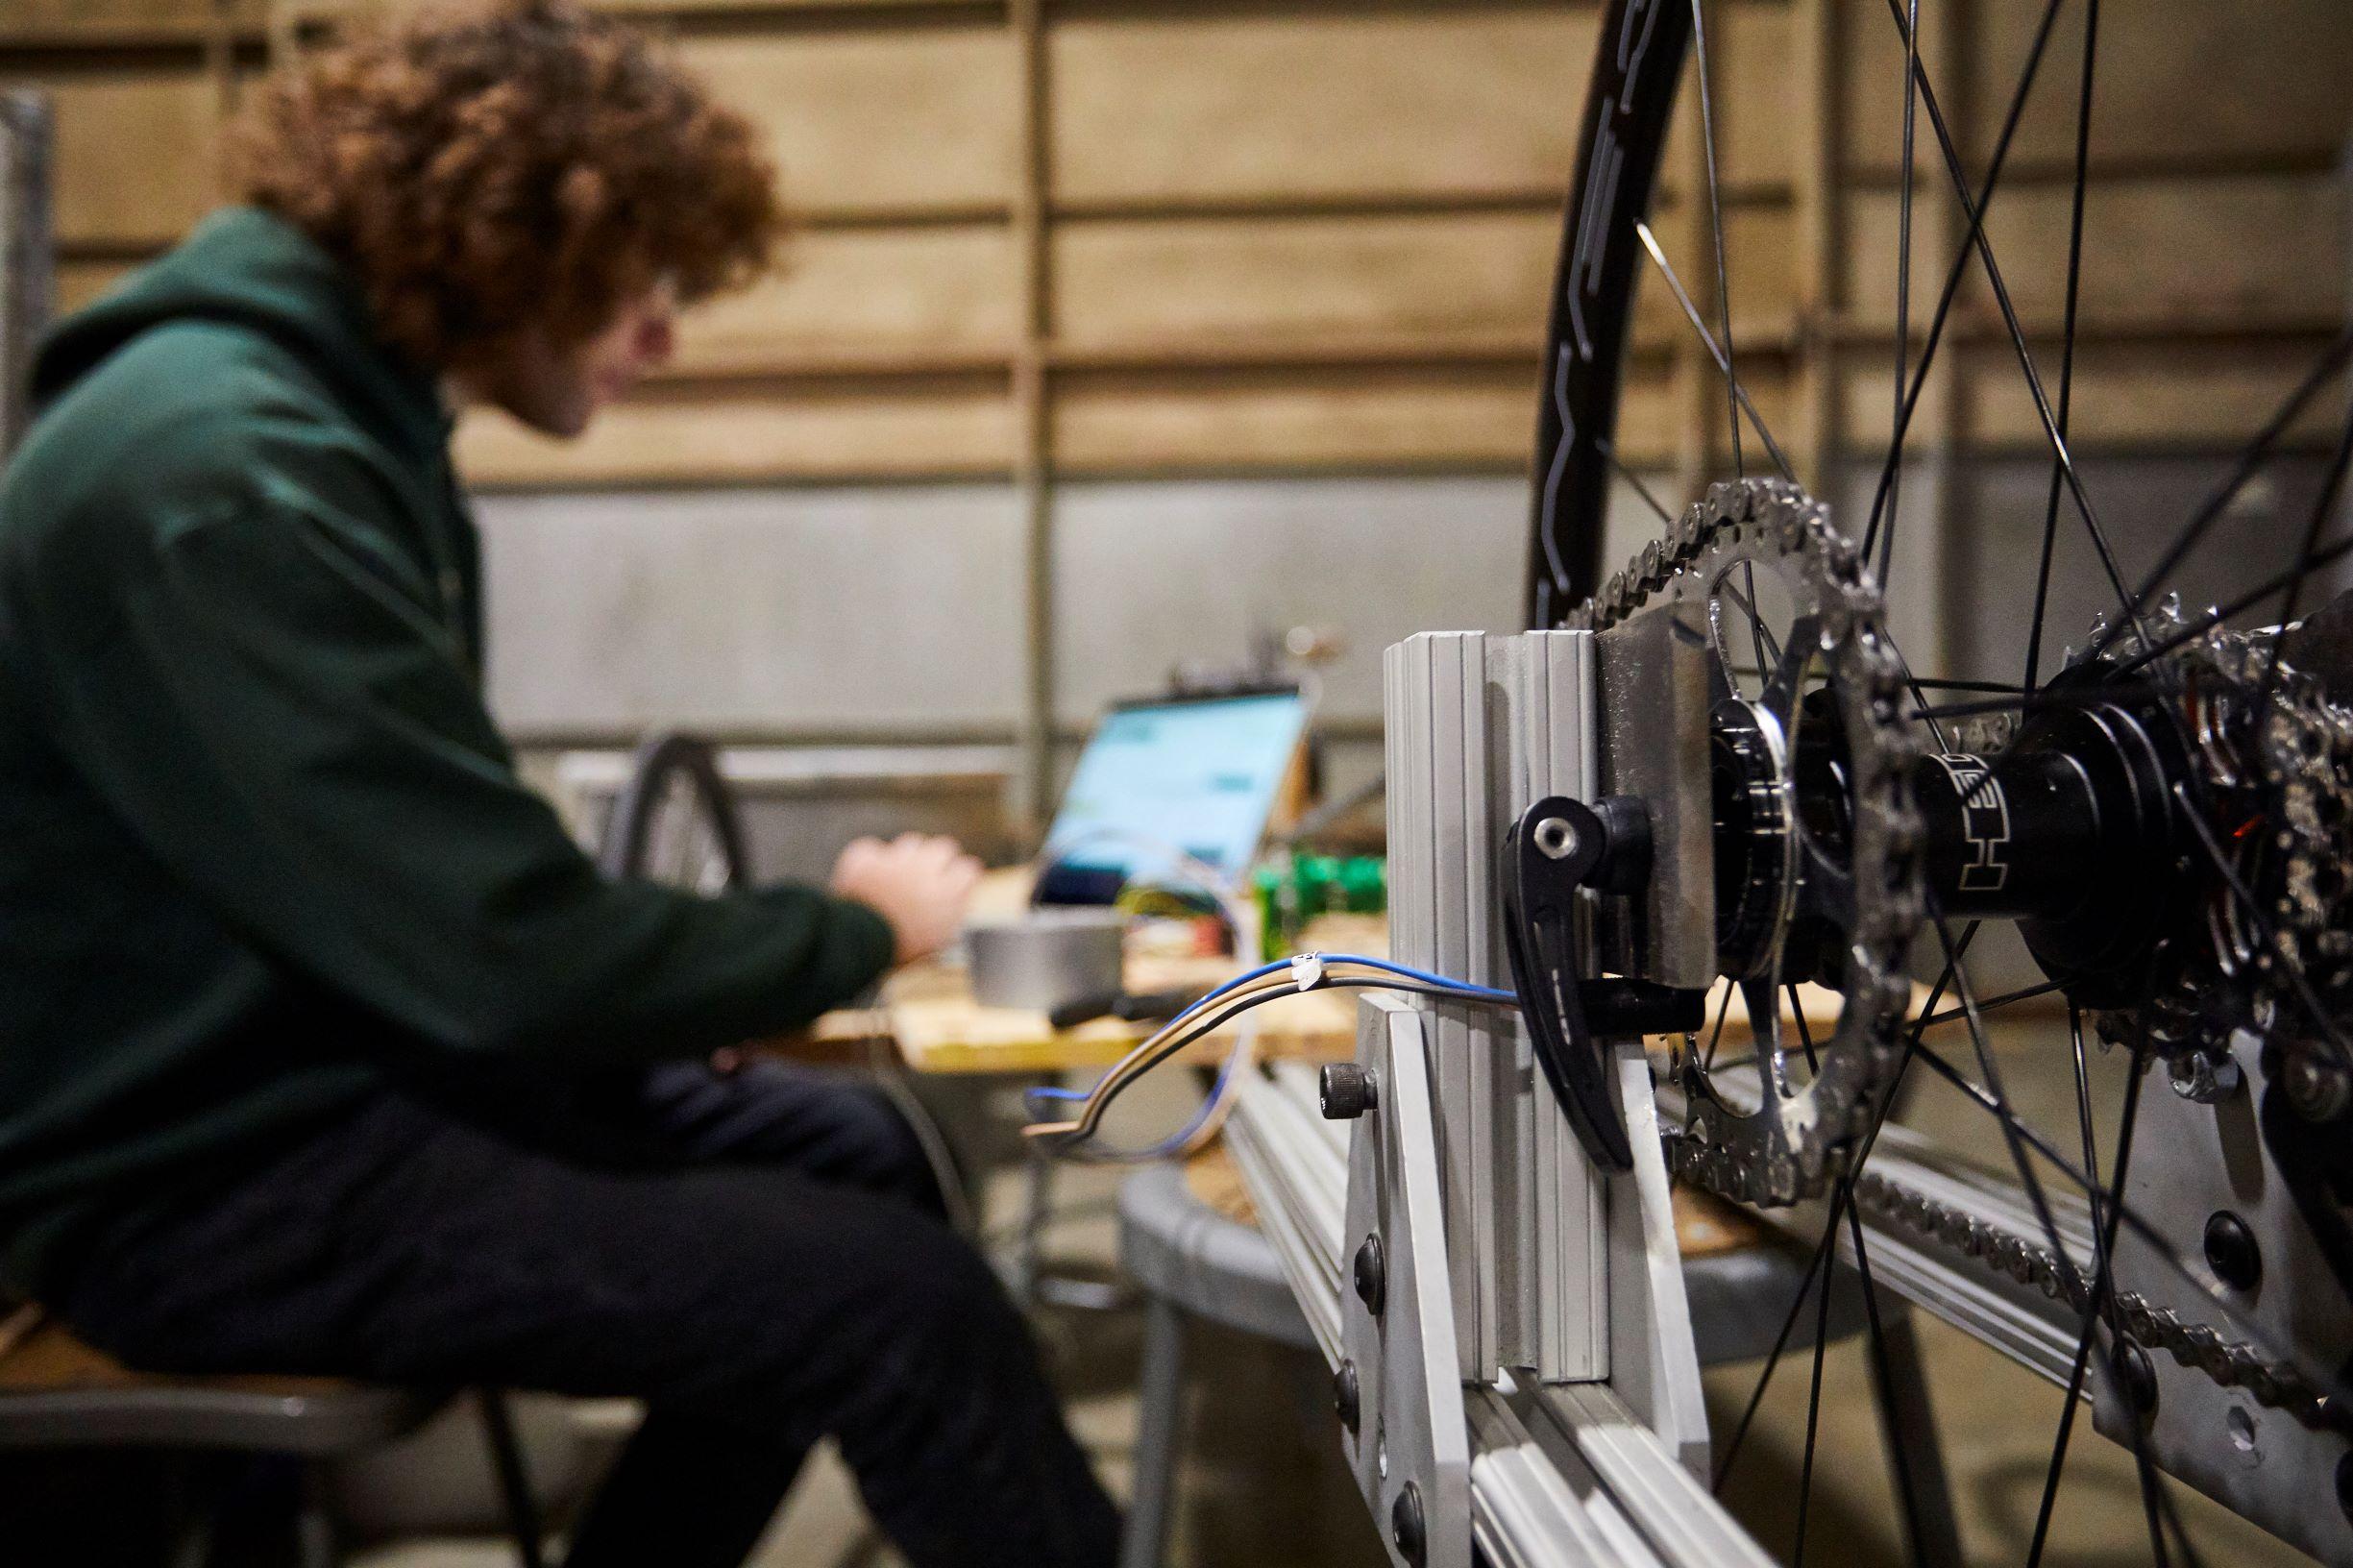 Sam Porter, who designed the reverse gear mechanism, runs tests on the prototype bike.